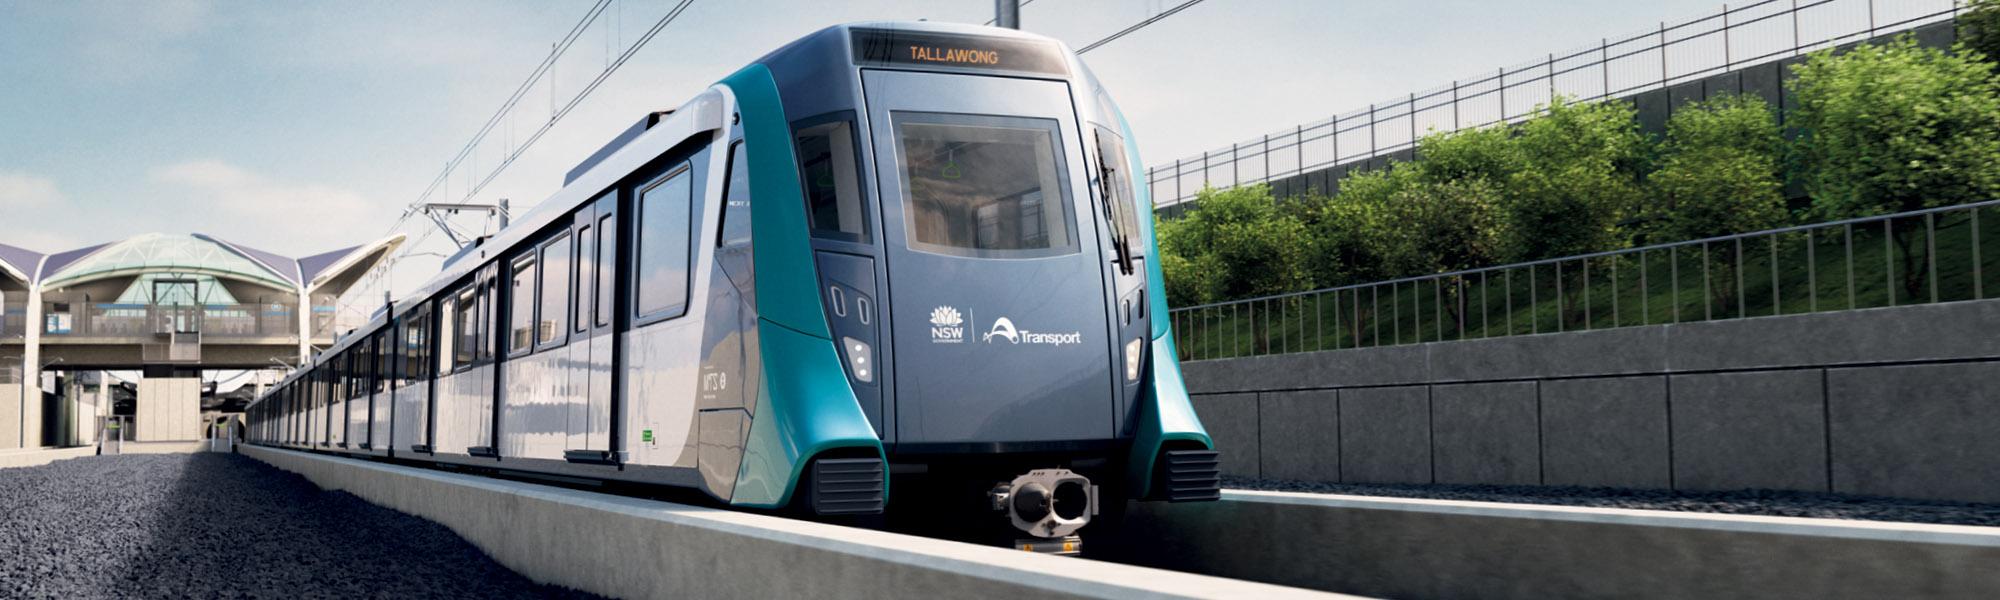 Metro | transportnsw info